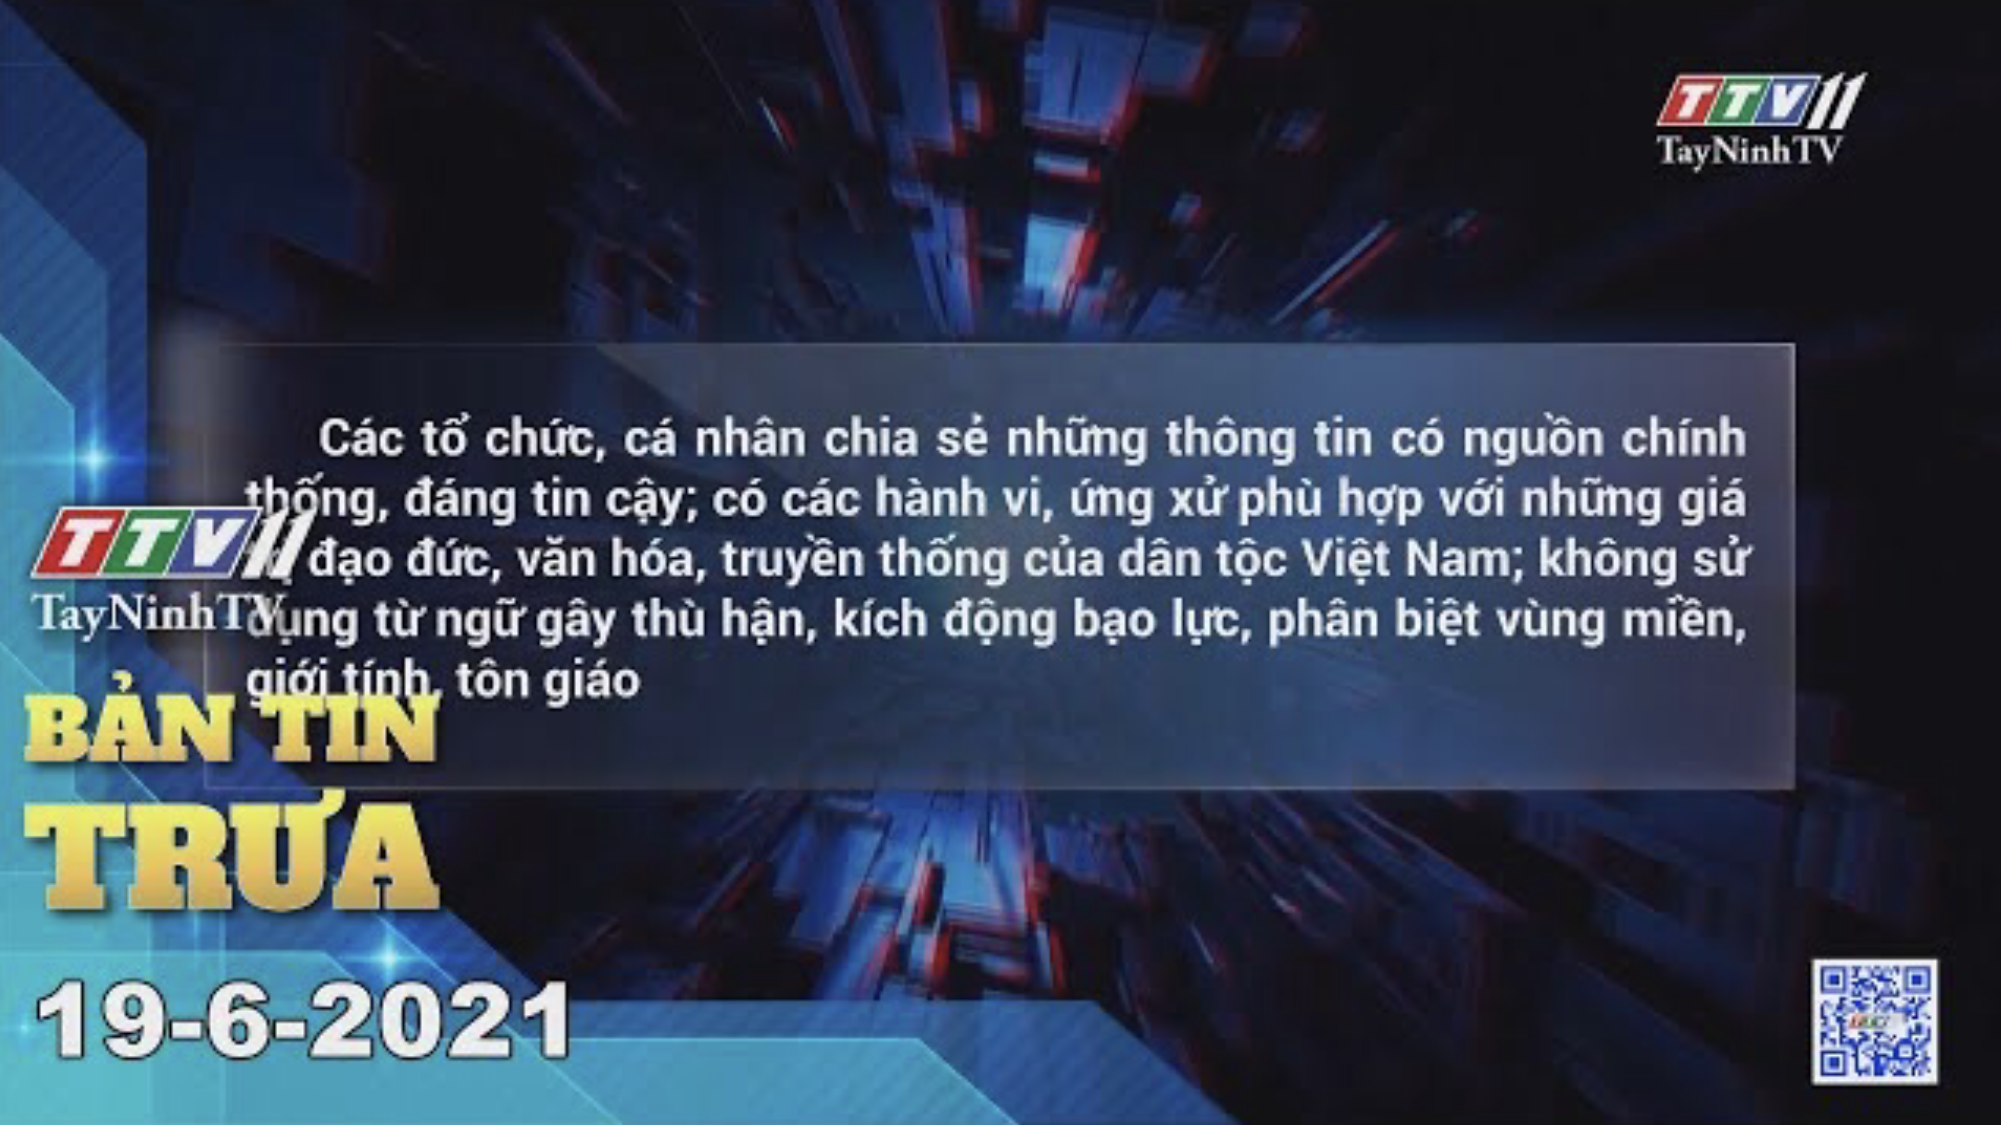 Bản tin trưa 19-6-2021 | Tin tức hôm nay | TayNinhTV